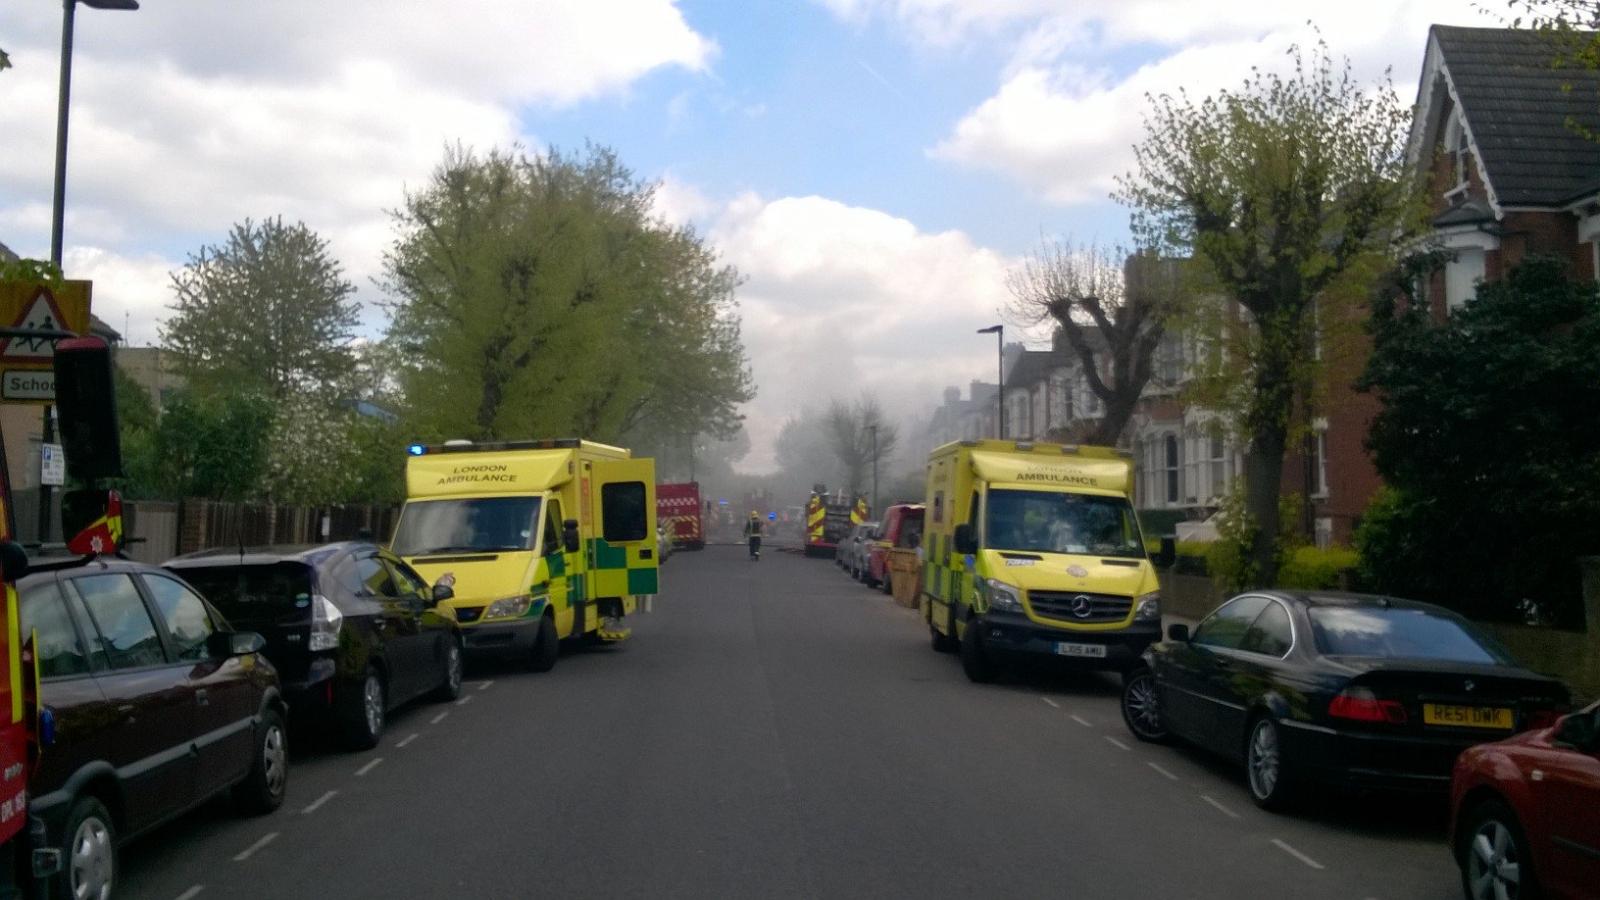 london explosion april 2017